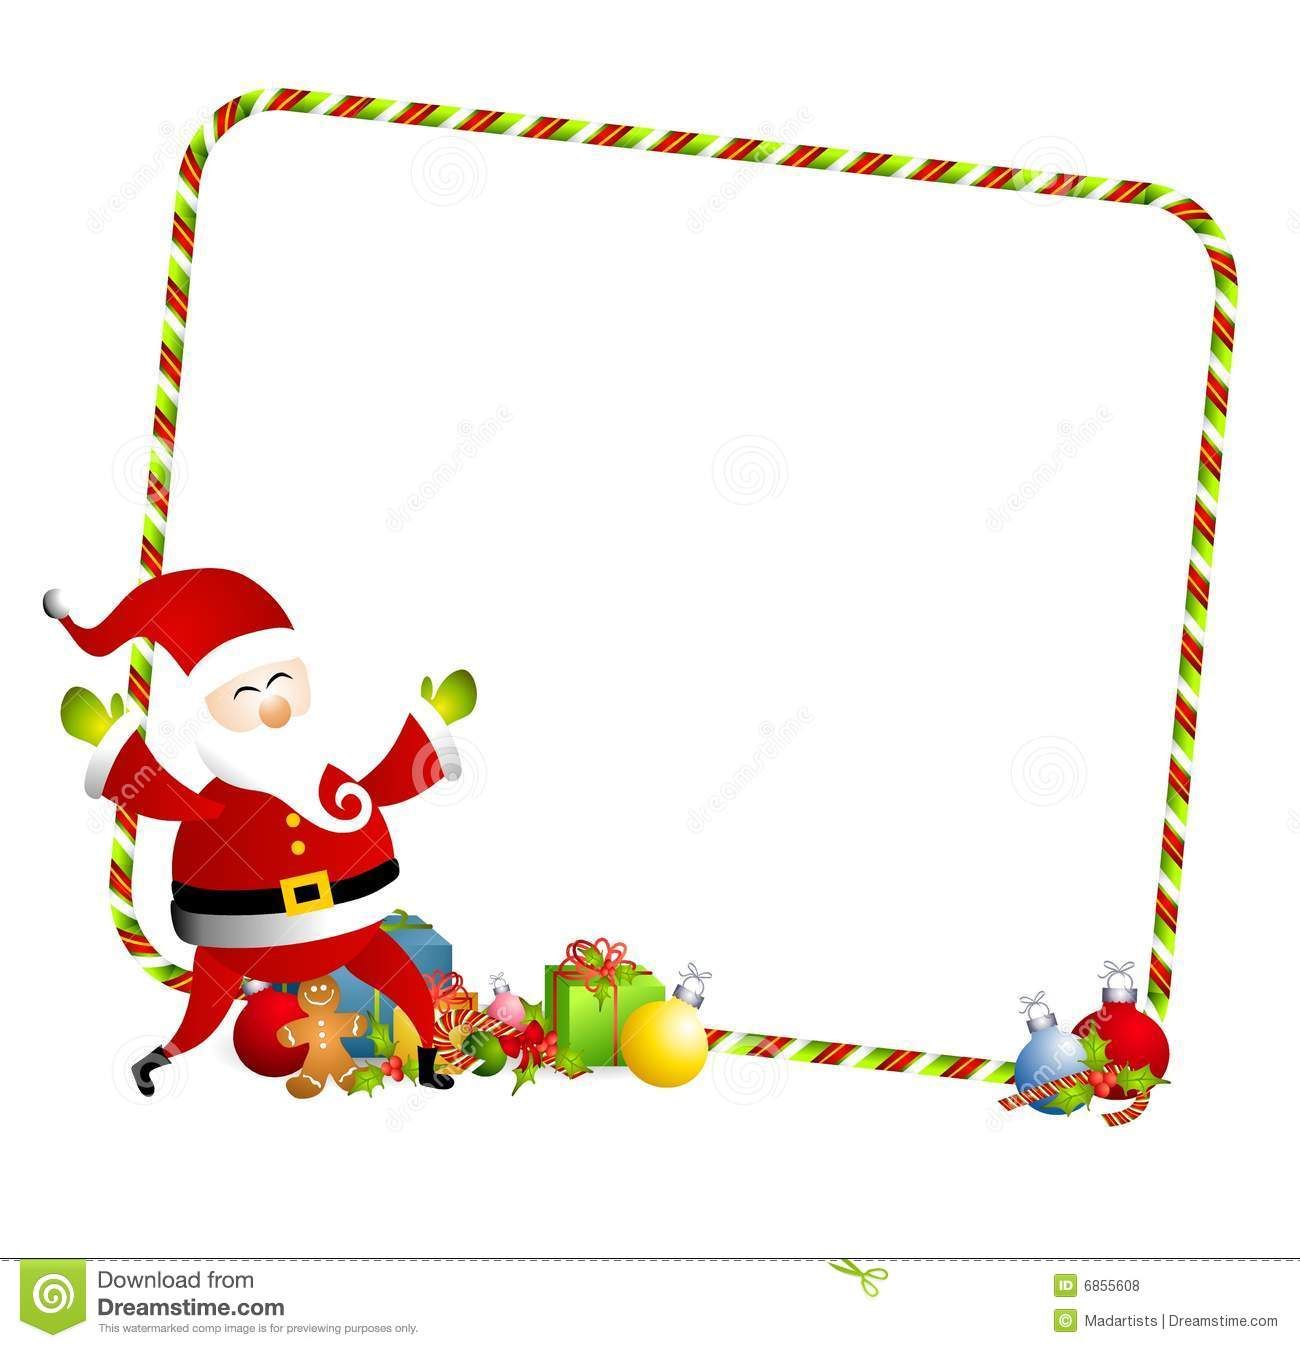 Frame clipart santa claus Images Border christmas%20present%20border%20clipart Clipart Clipart